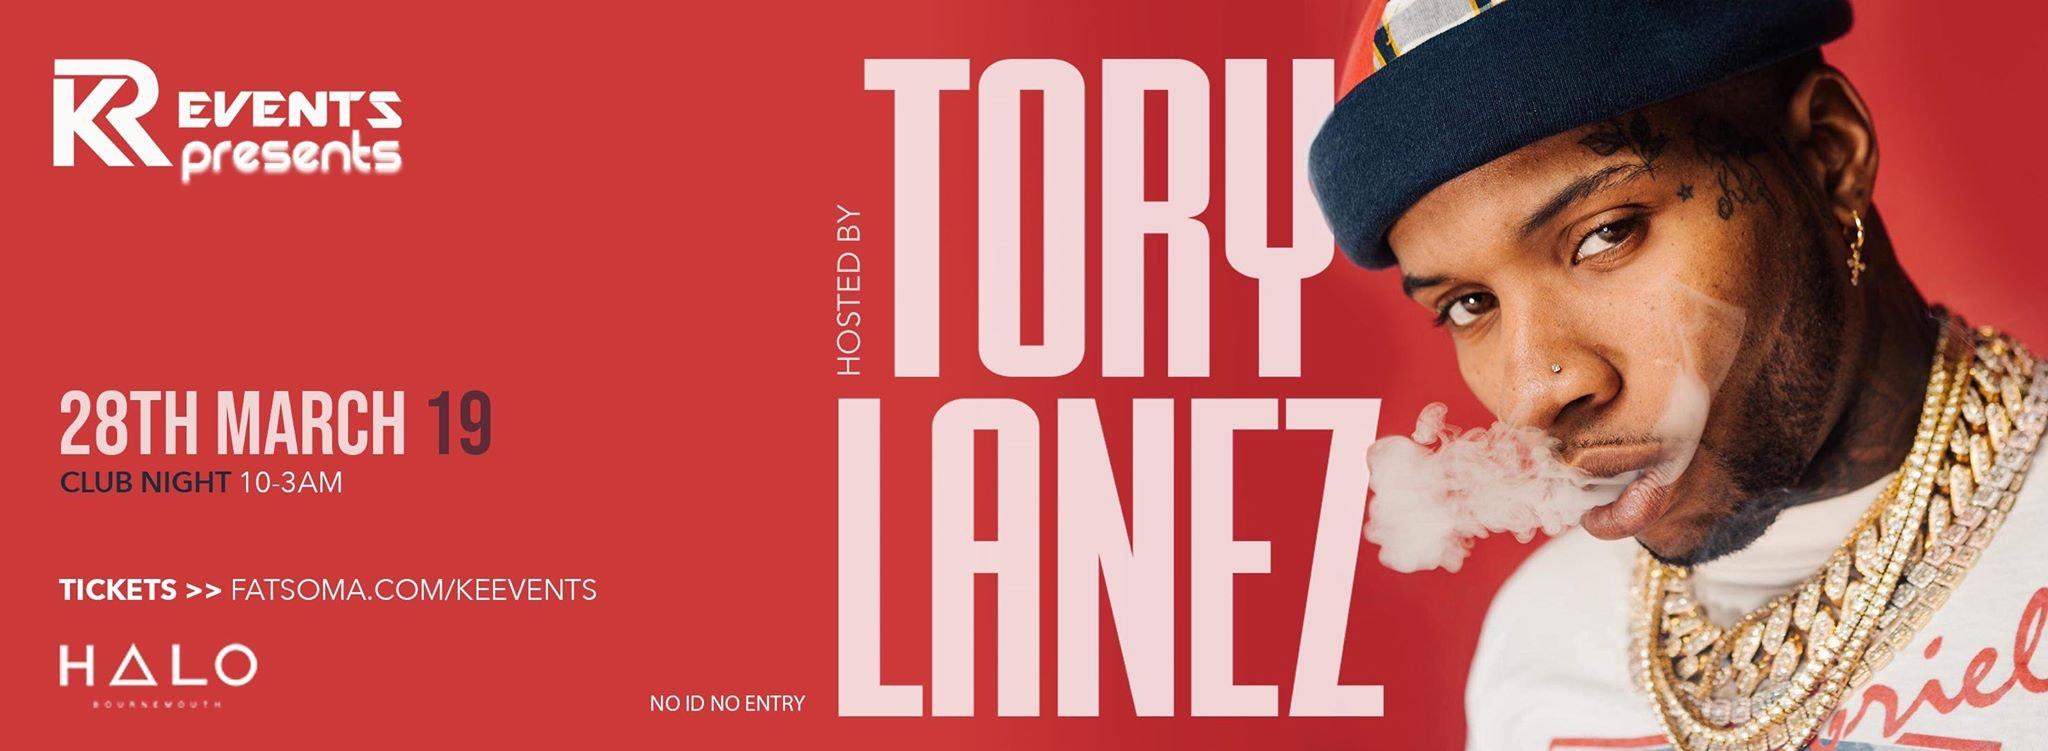 KR Events presents Tory Lanez